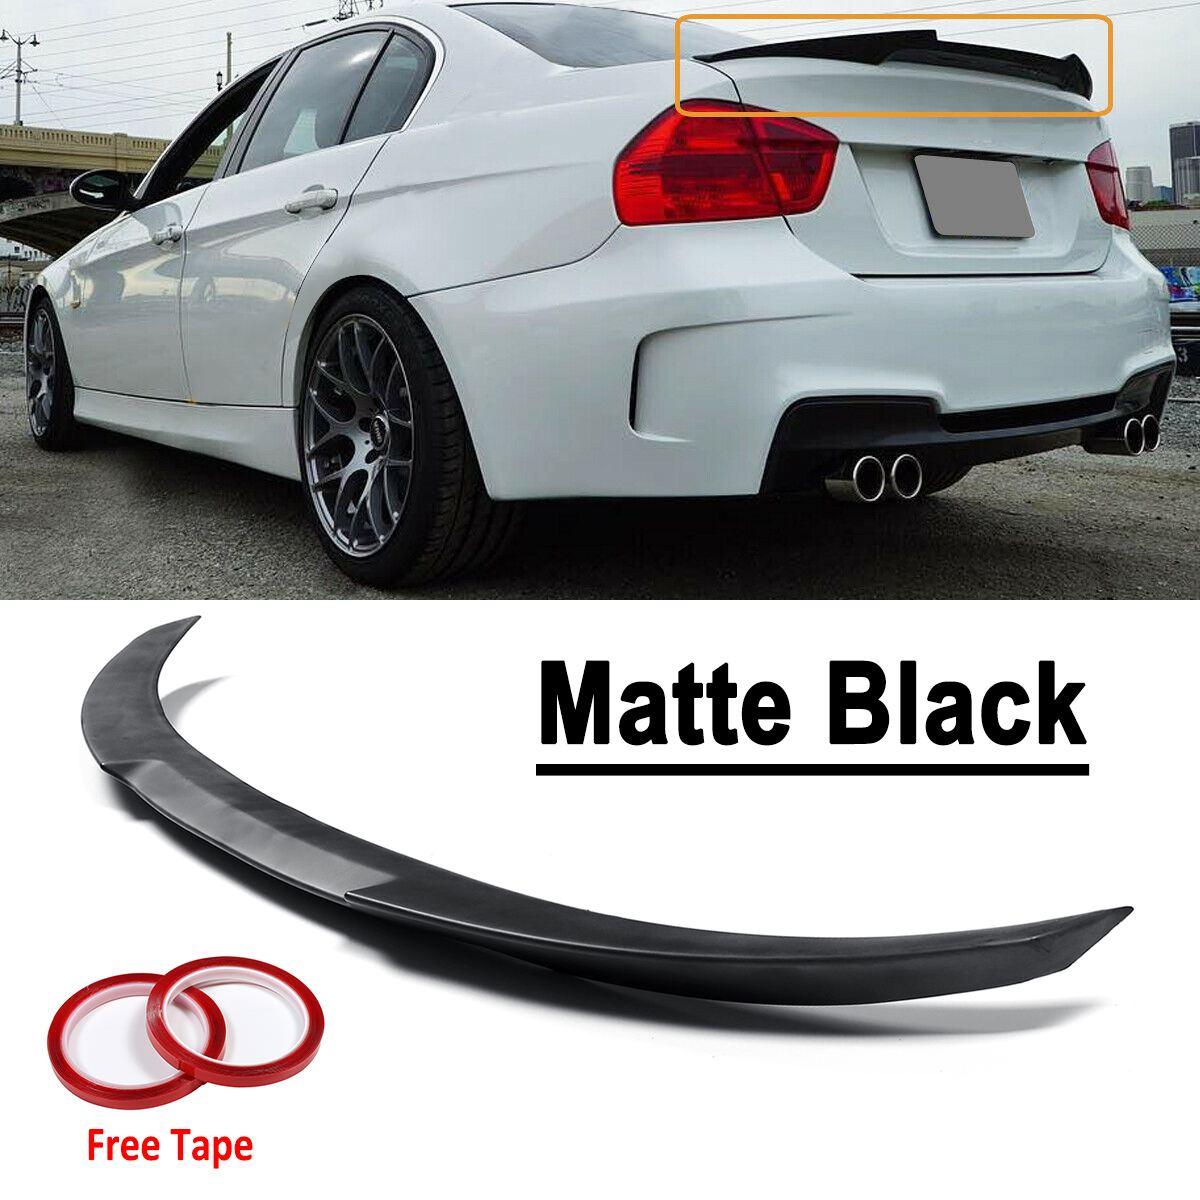 Matte Black ABS สปอยเลอร์ปีก M4-Style สำหรับ BMW 2006-2011 E90 3 SERIES 4 ประตูสำหรับ BMW 2008-12 M3 ซีดาน